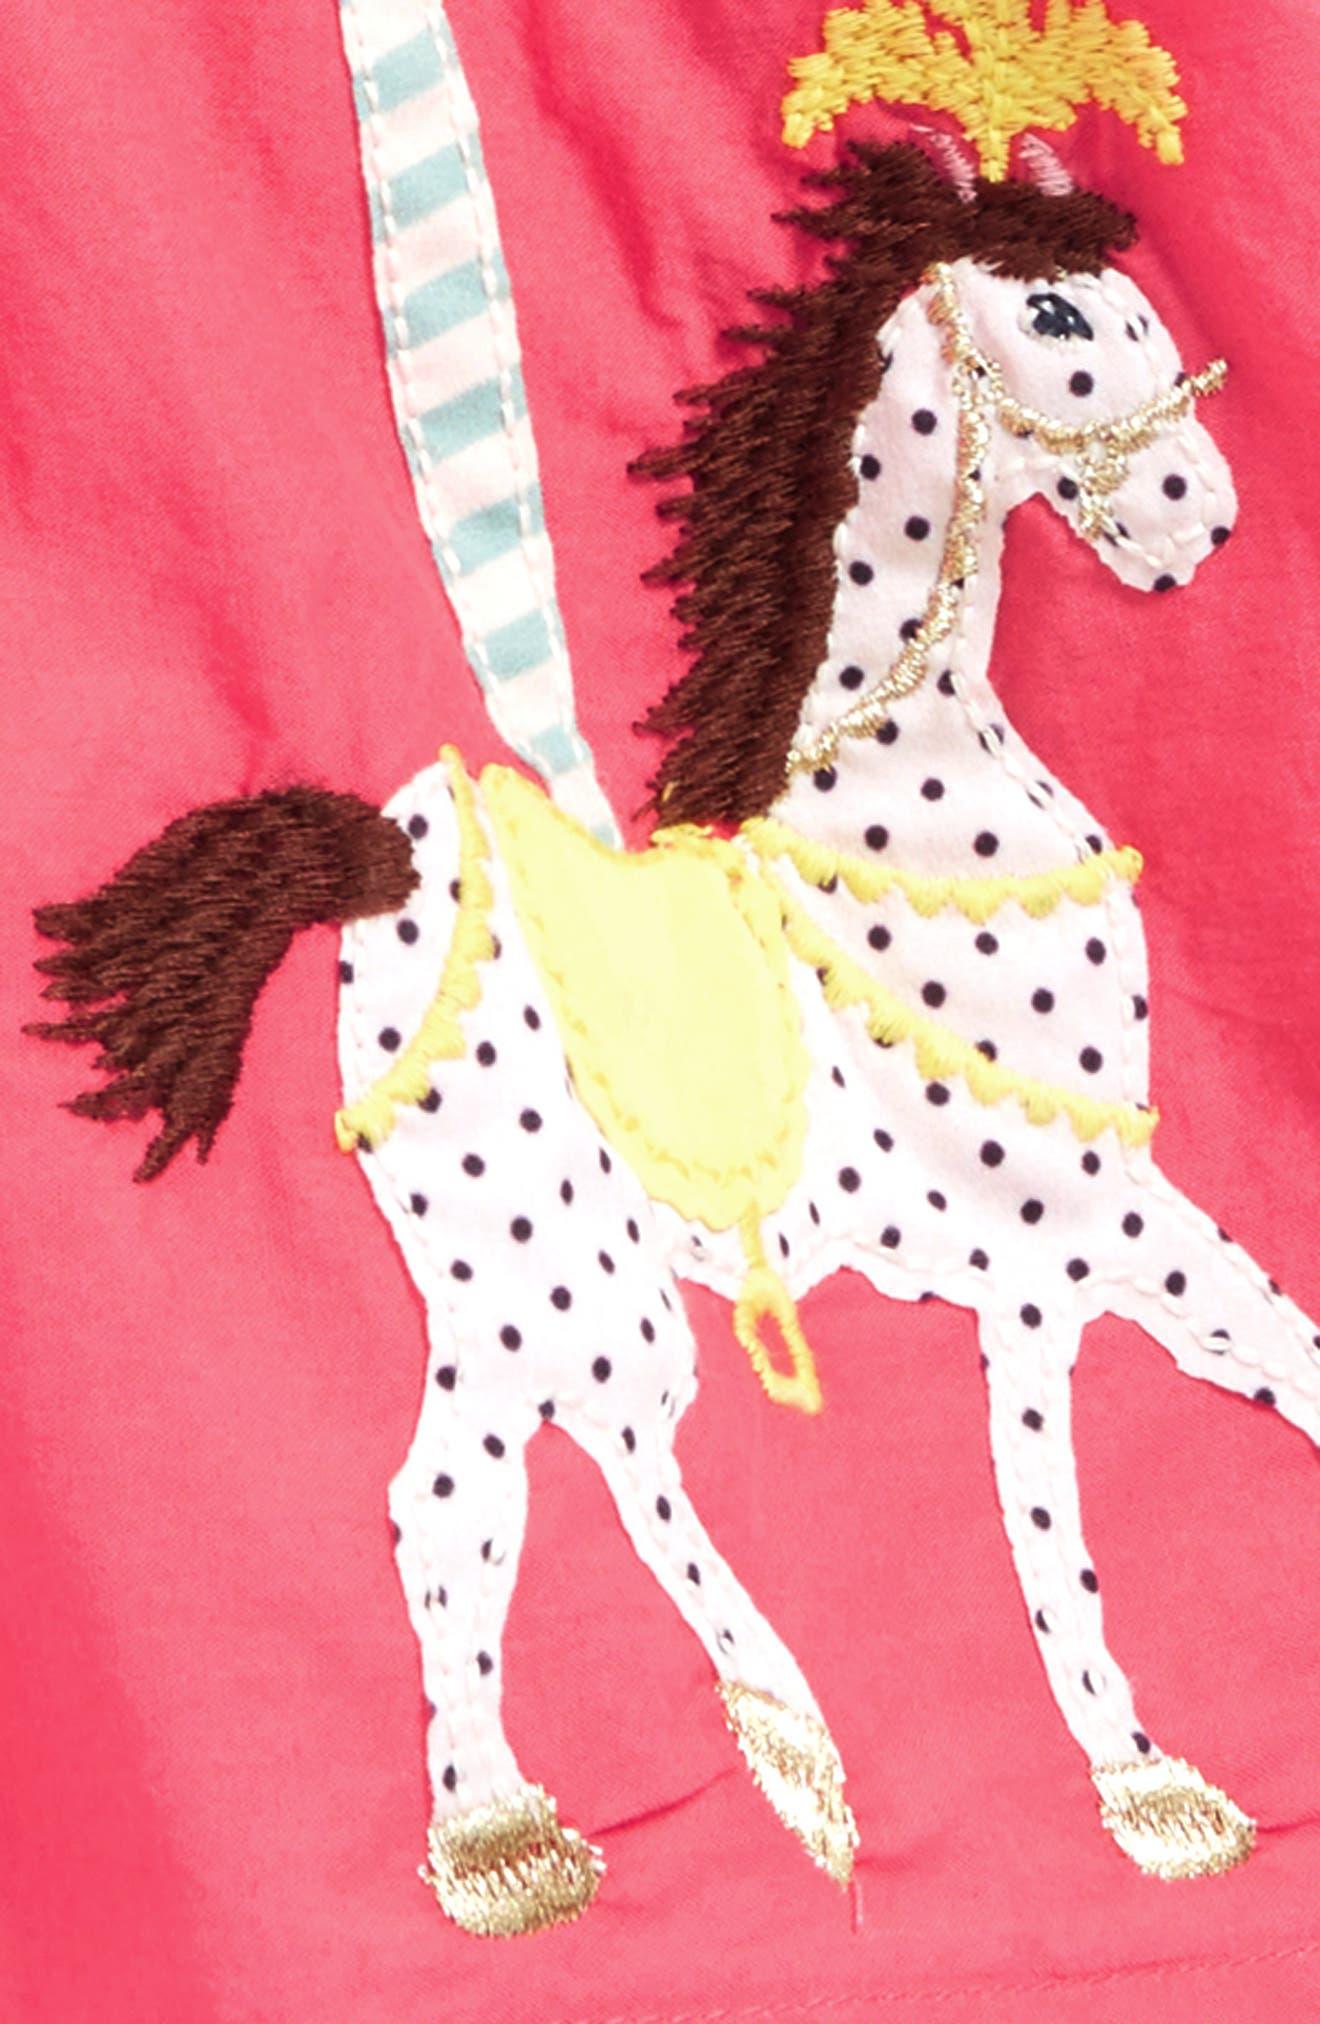 Colorful Appliqué Skirt,                             Alternate thumbnail 2, color,                             Provence Dusty Pink Horses Pnk